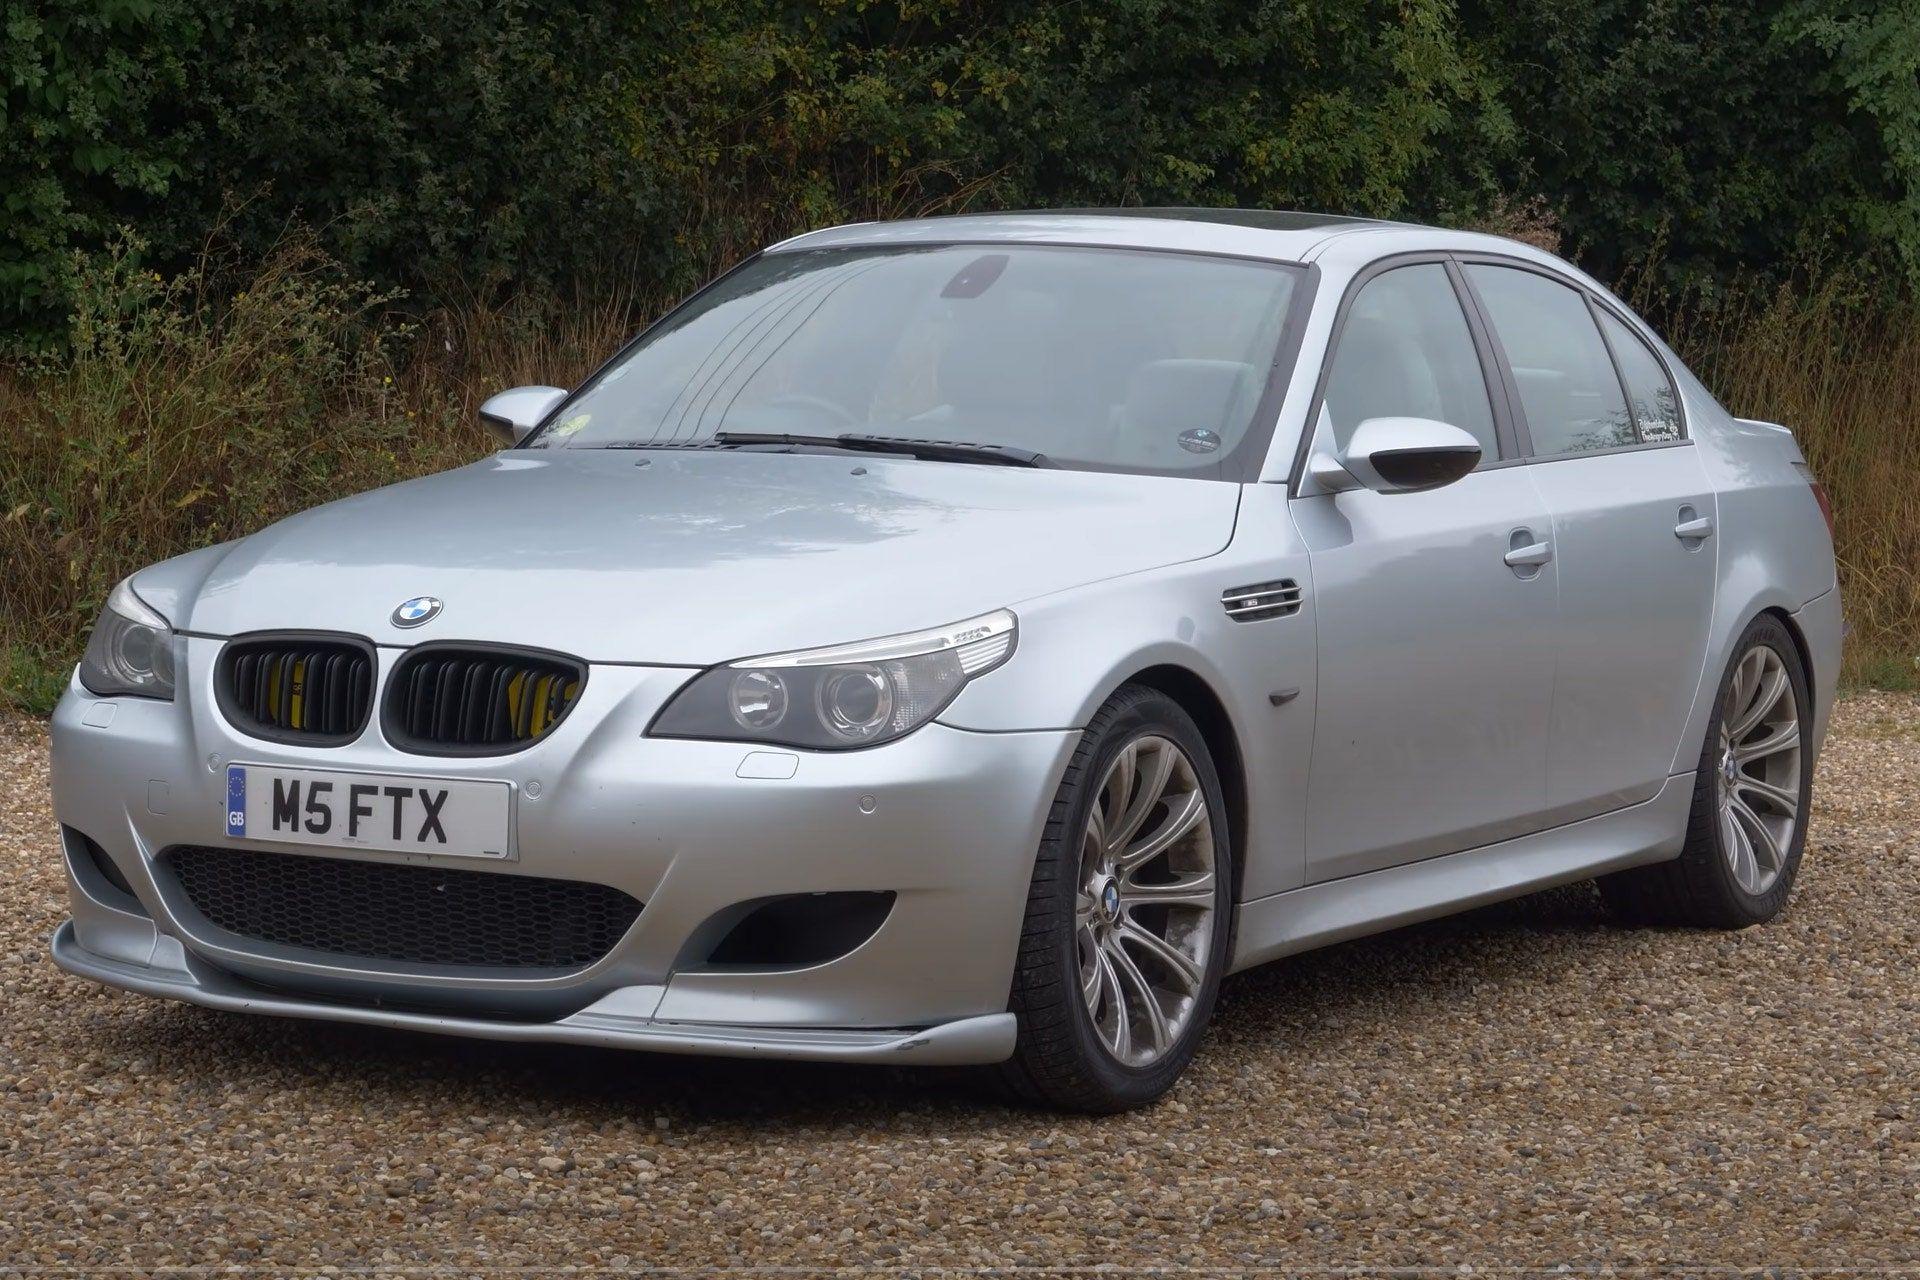 "<img src=""elon-musk-hamman-m5.jpg"" alt=""A Hamman-tuned BMW M5"">"